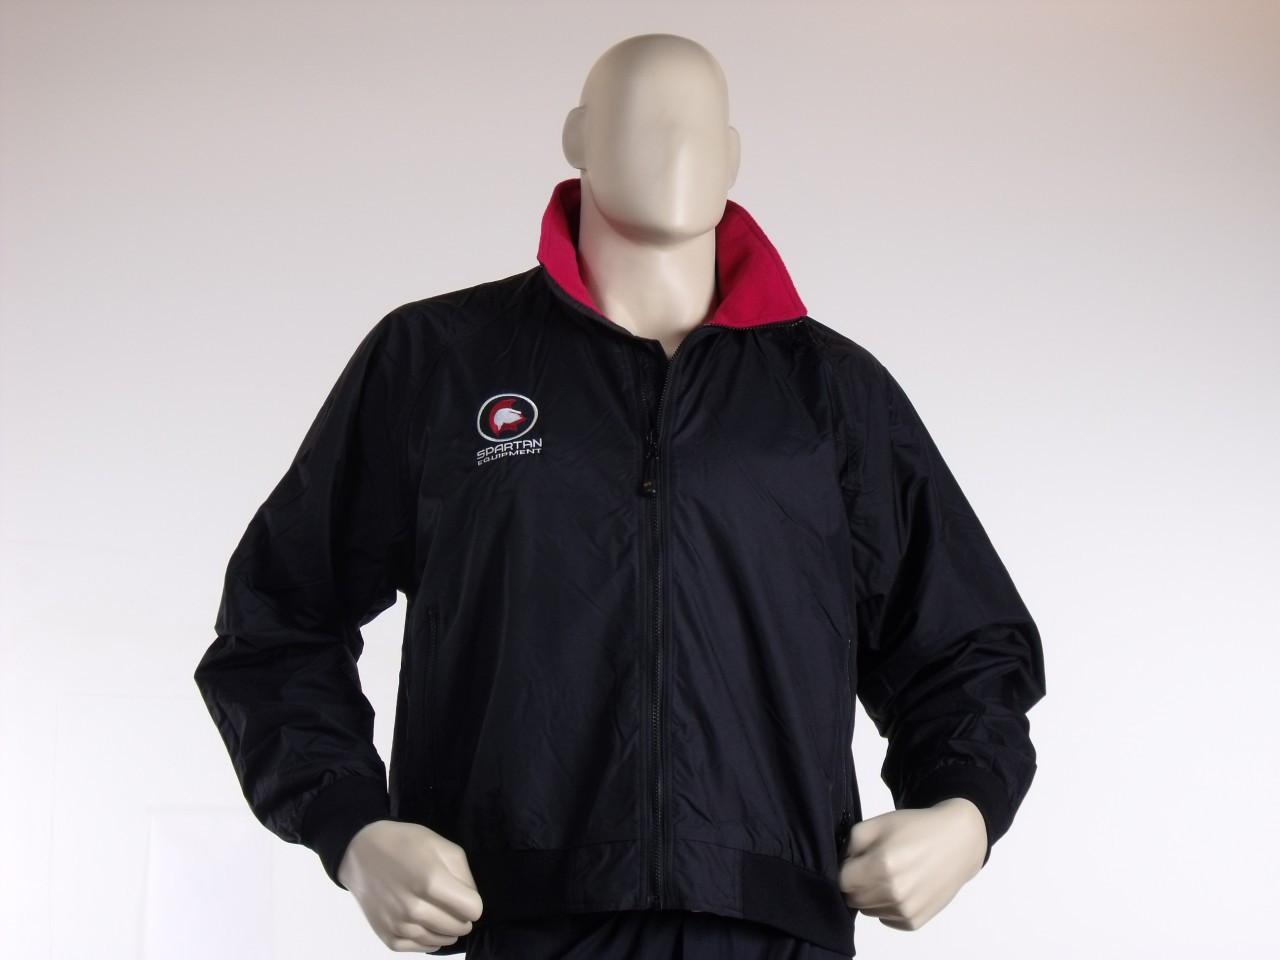 Spartan Equipment 365 Tough & Lite™ Jacket Black/Red